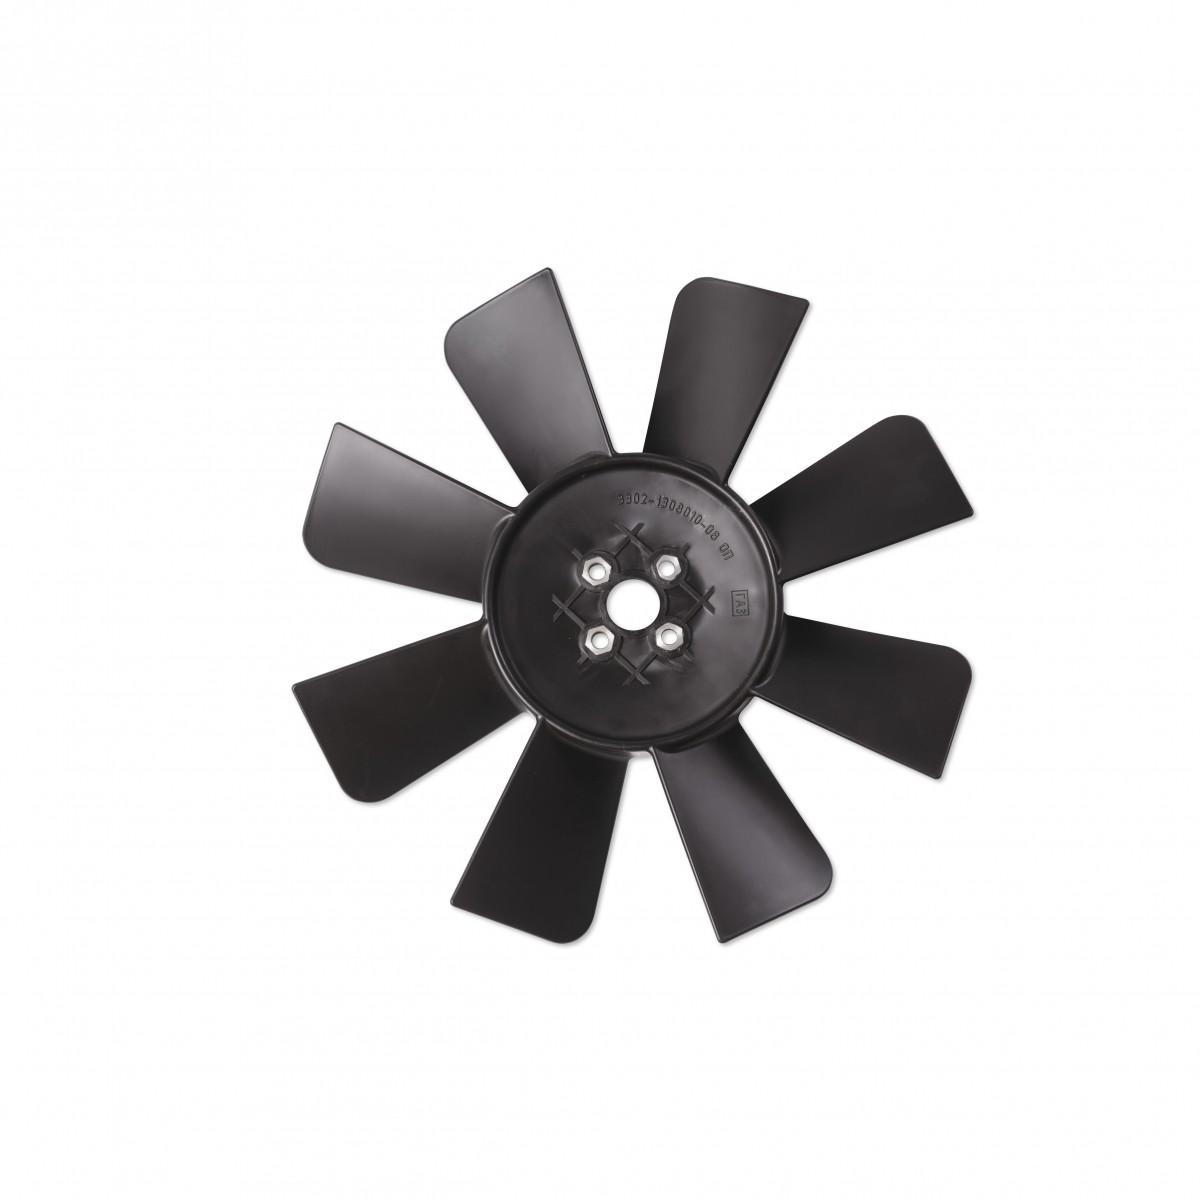 Lada 2101-2107 2108-2115 Coolant Fan 8 Blades For Electric Fan Engine